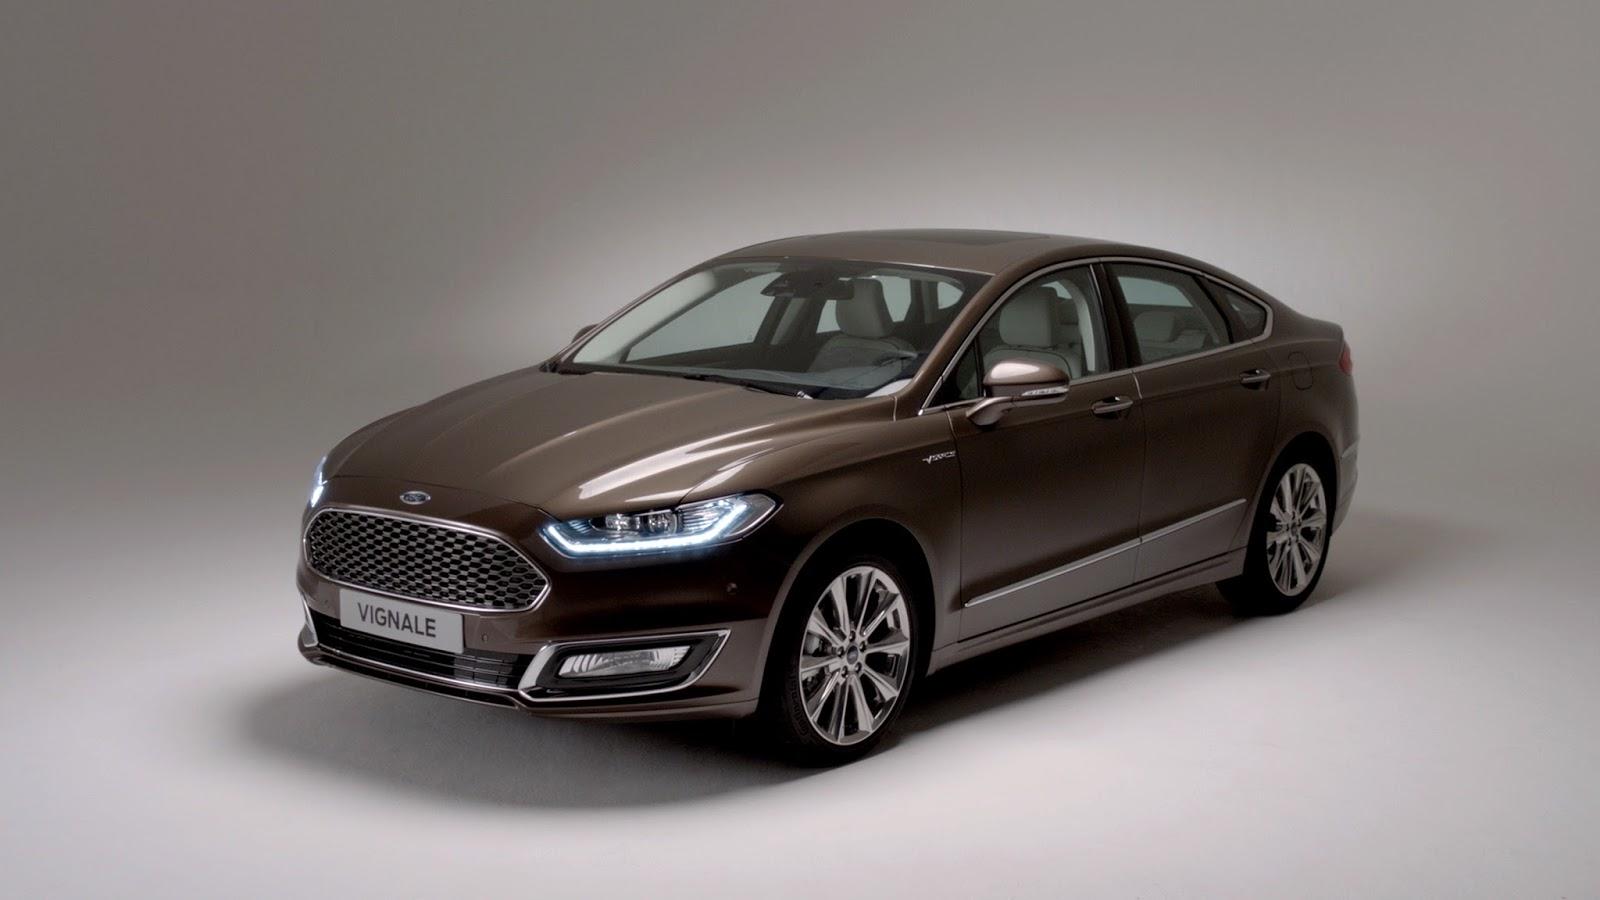 FordVignale Mondeo 4door 01 Δες το τετρακίνητο Ford Focus RS και την νέα Mustang παρέα με όλα τα Ford στην έκθεση αυτοκινήτου 2015